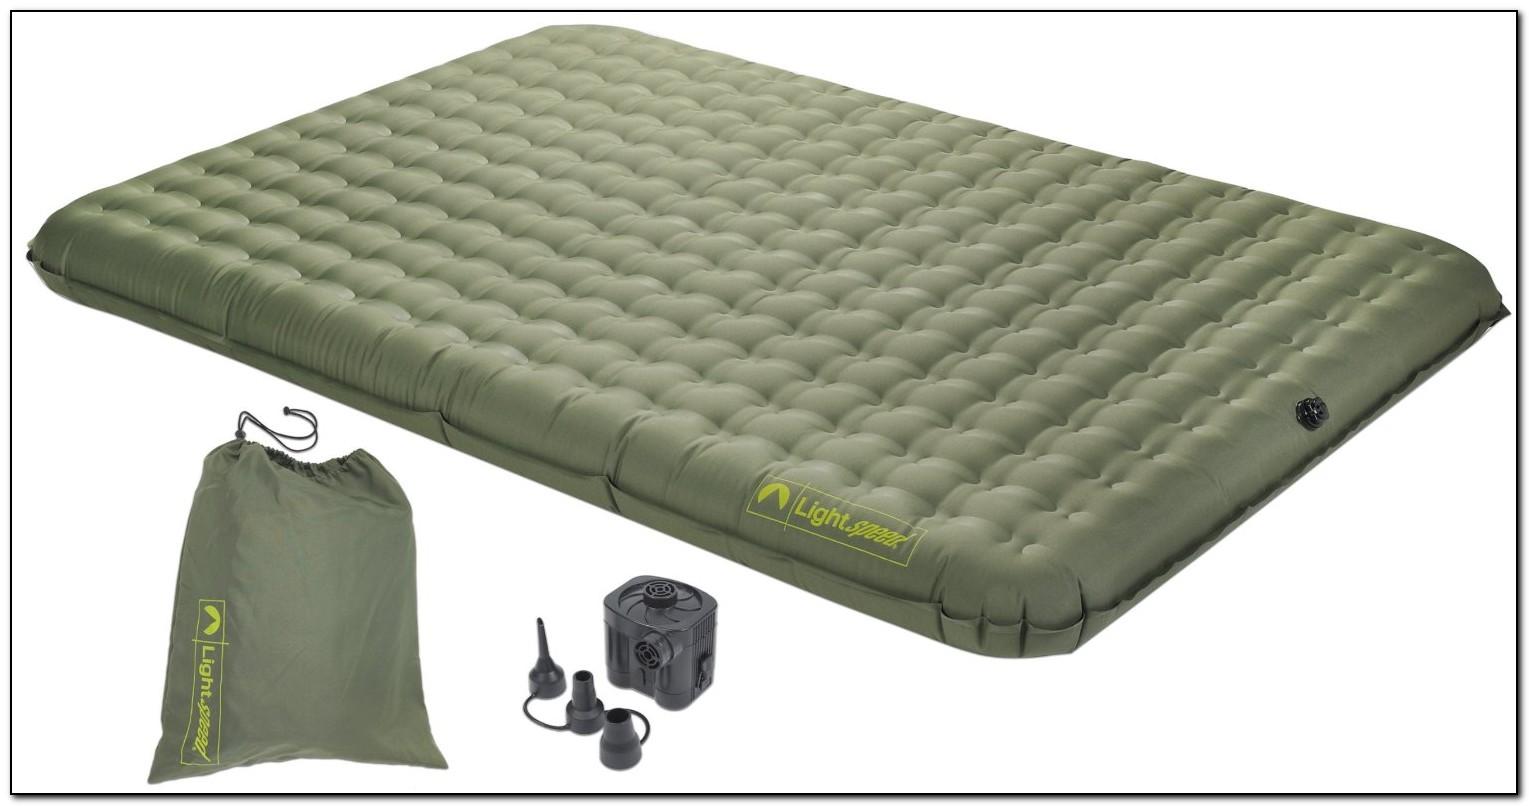 Best Air Bed 2014